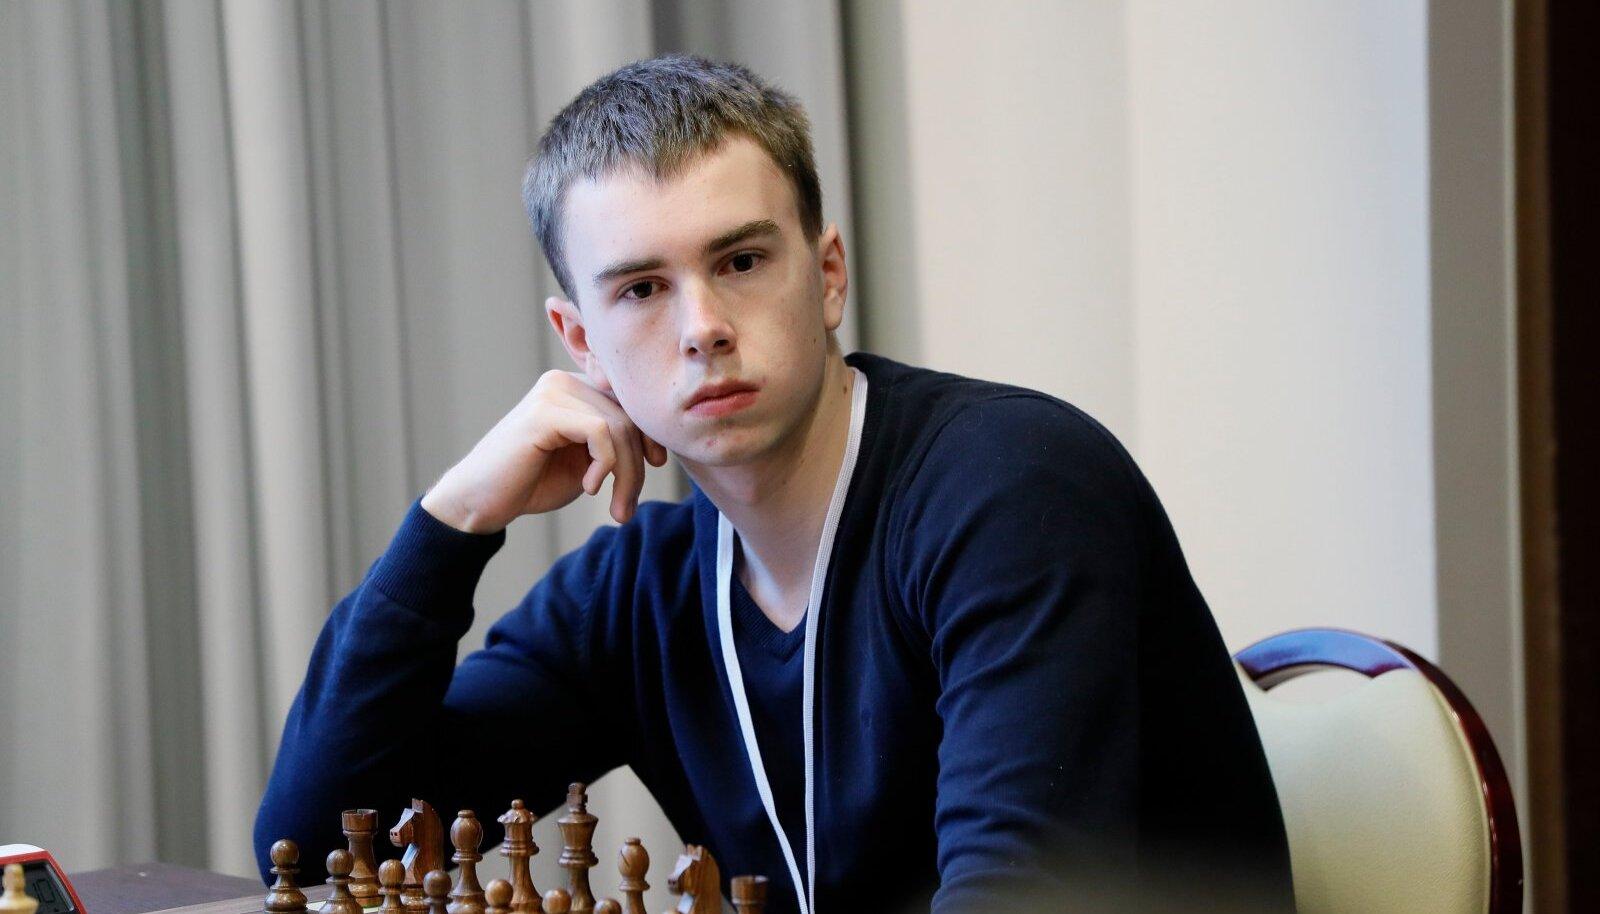 Невероятно! 23-летний эстонец заработал за полтора месяца 1 млн евро